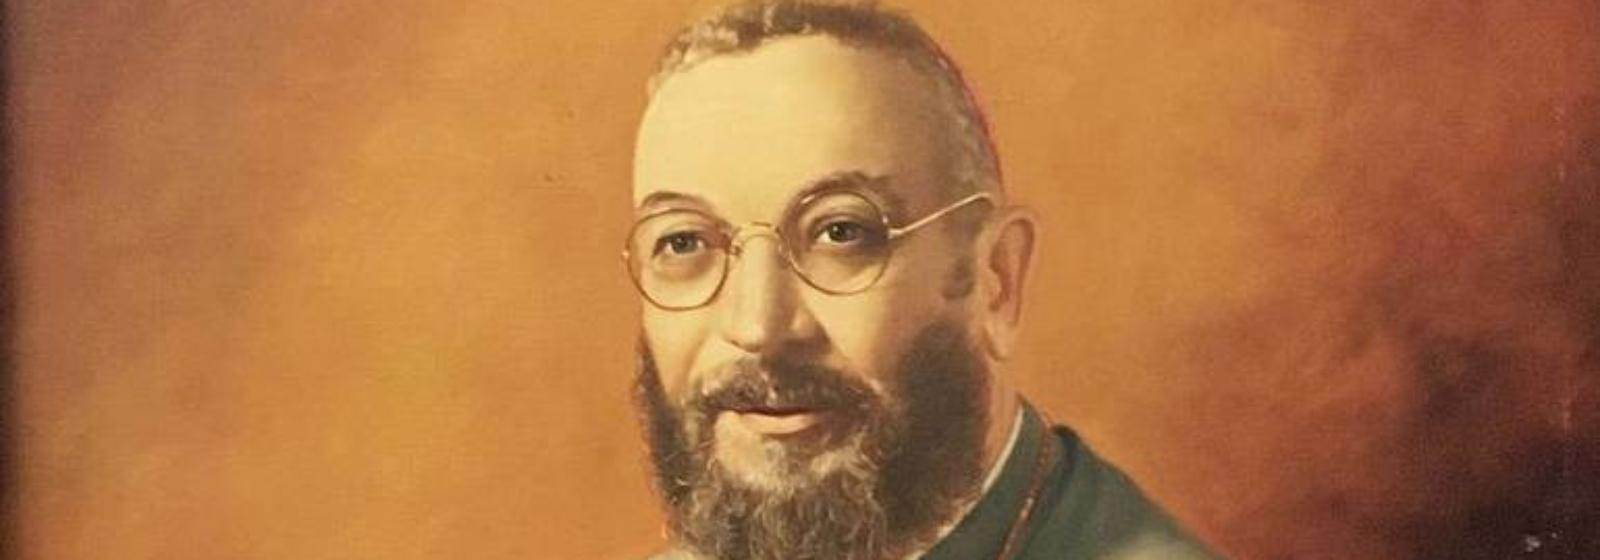 La Terra Santa: ieri - oggi, in memoria di mons. Alberto Gori